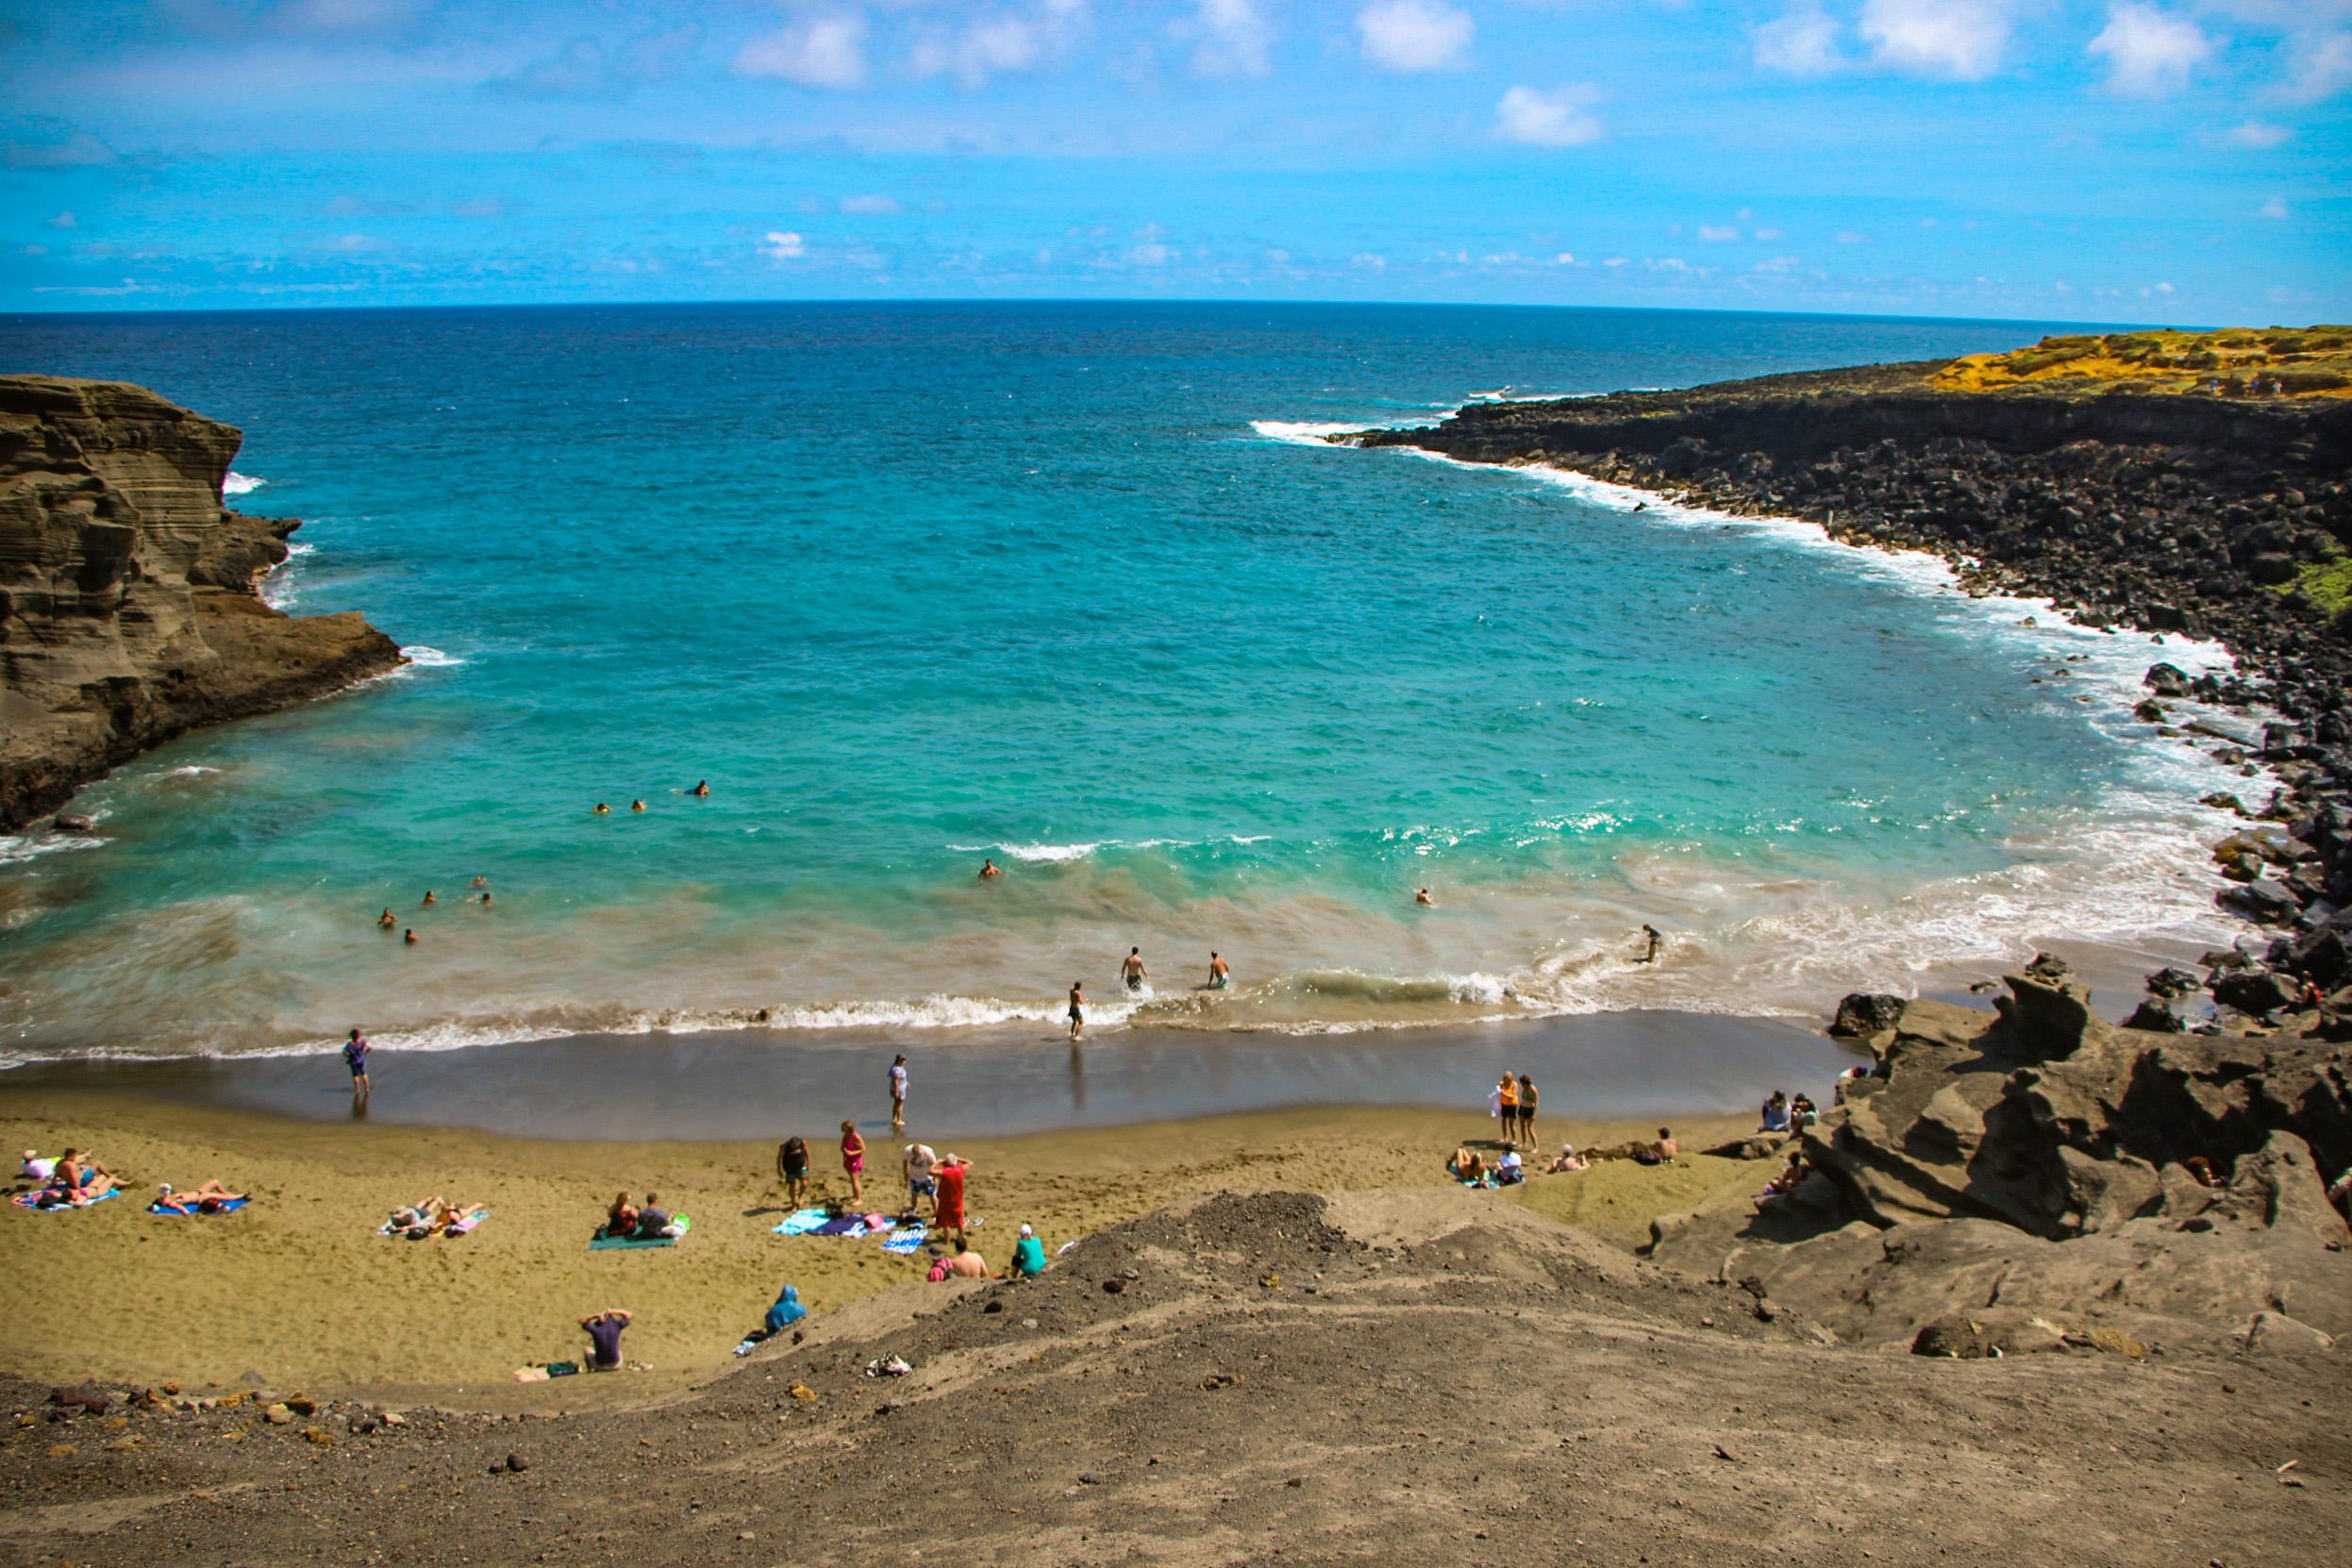 BIG ISLAND,Papakolea Green Sand Beach